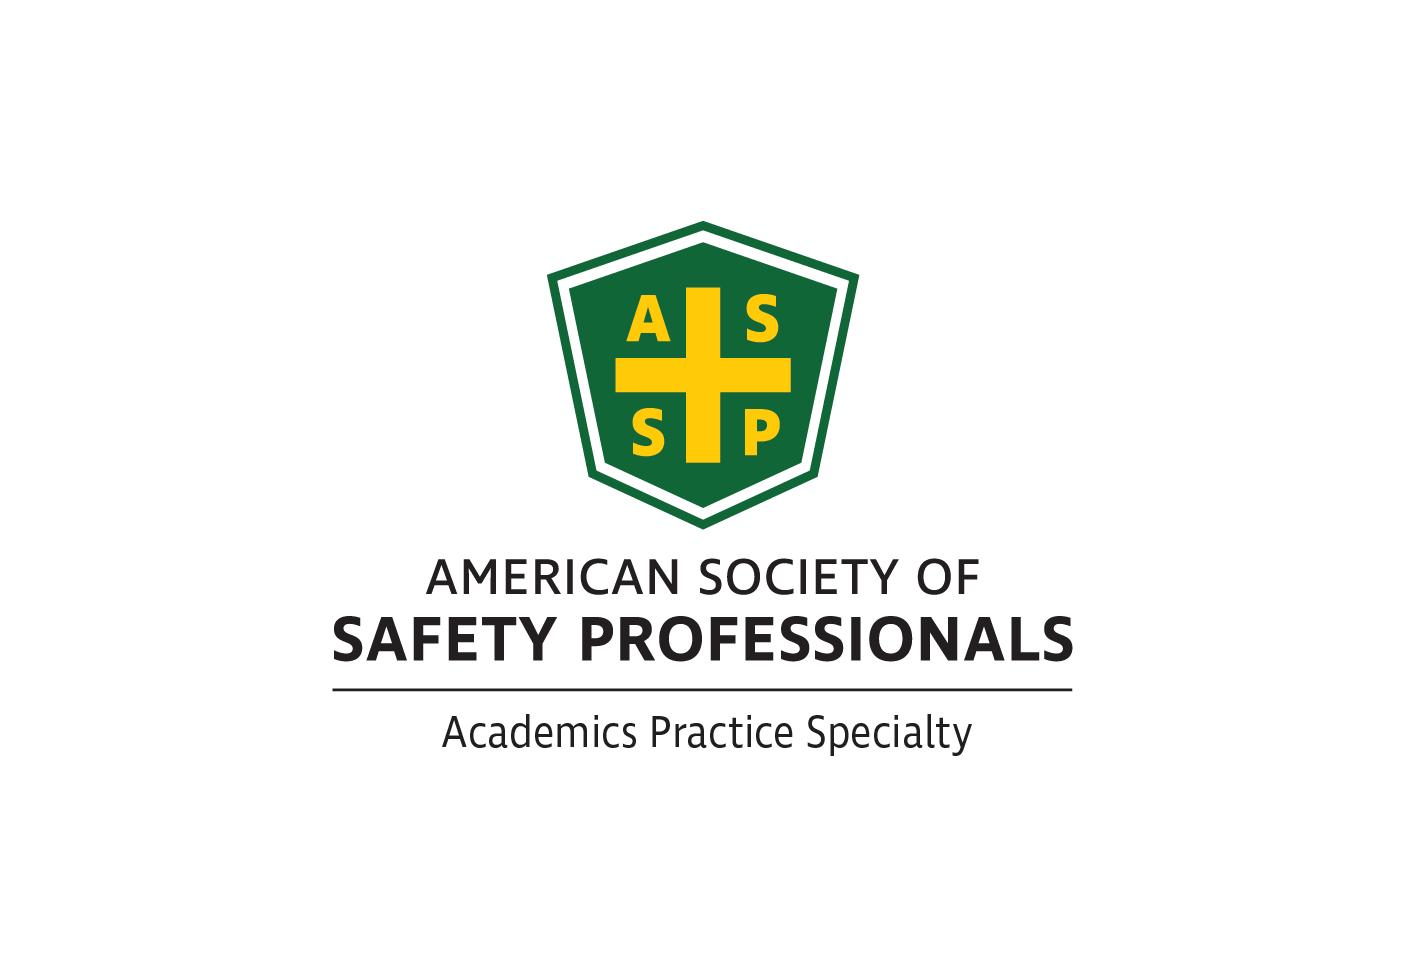 Academics Practice Specialty